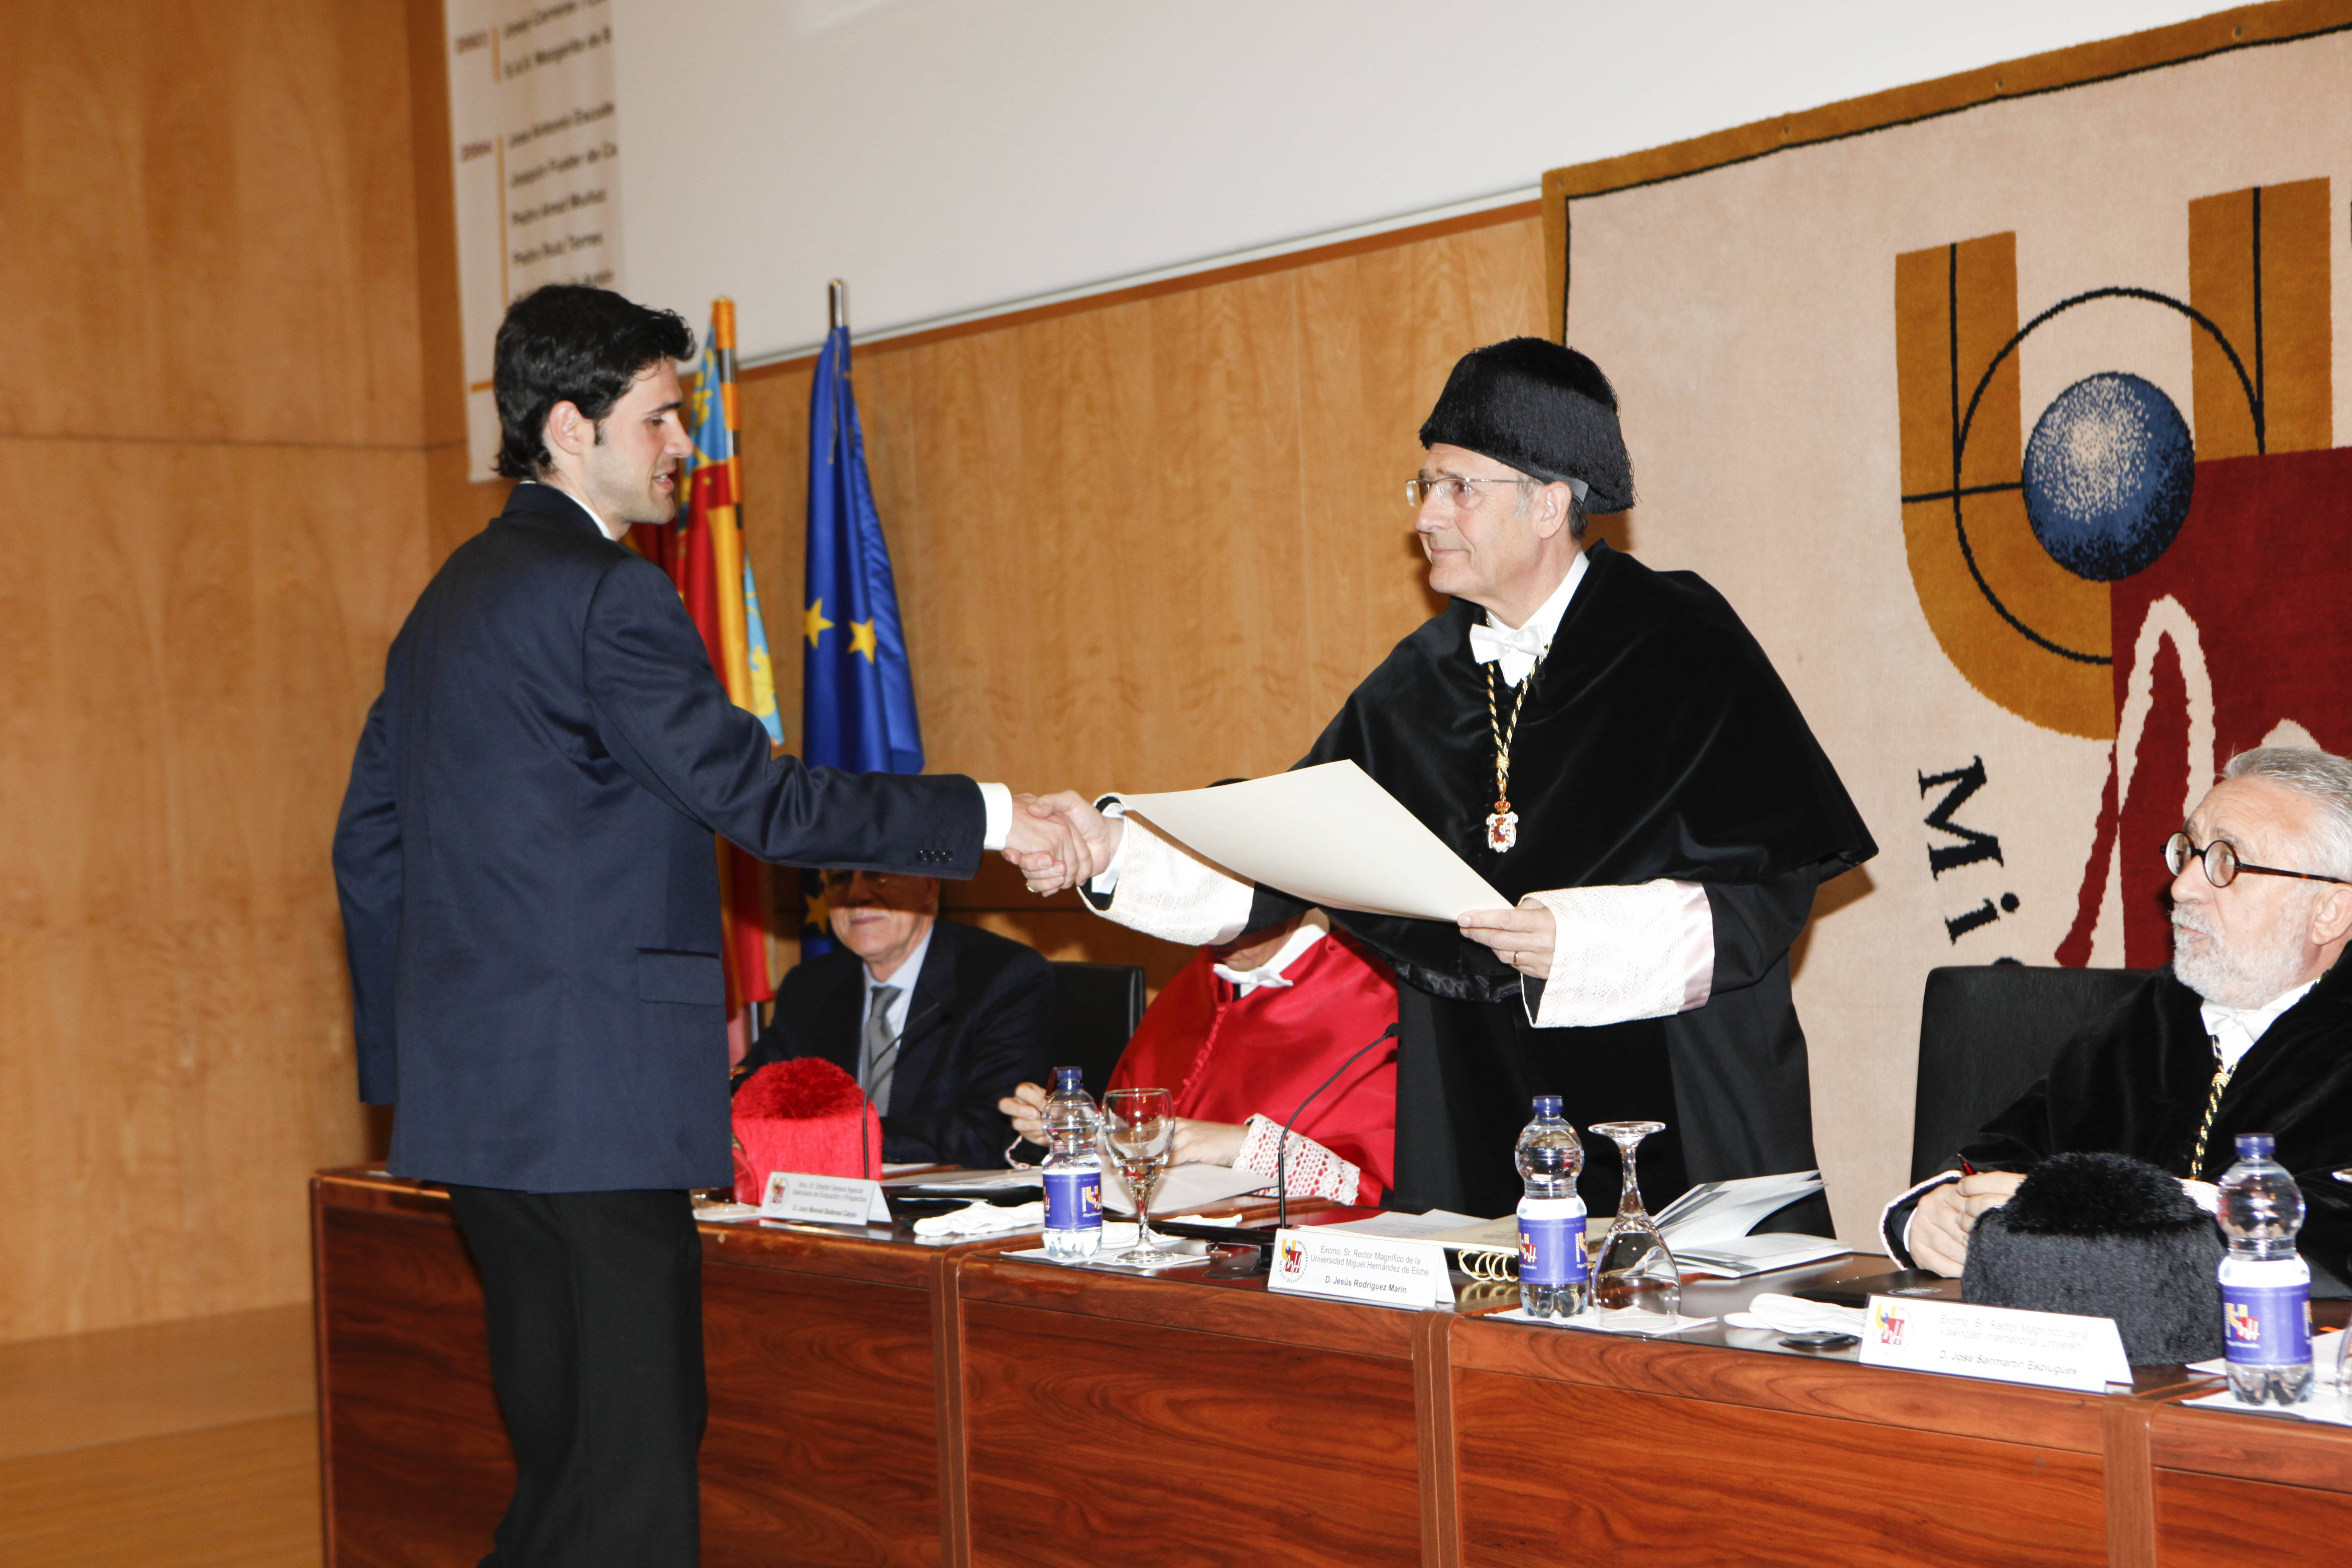 doctor-honoris-causa-luis-gamir_mg_0903.jpg